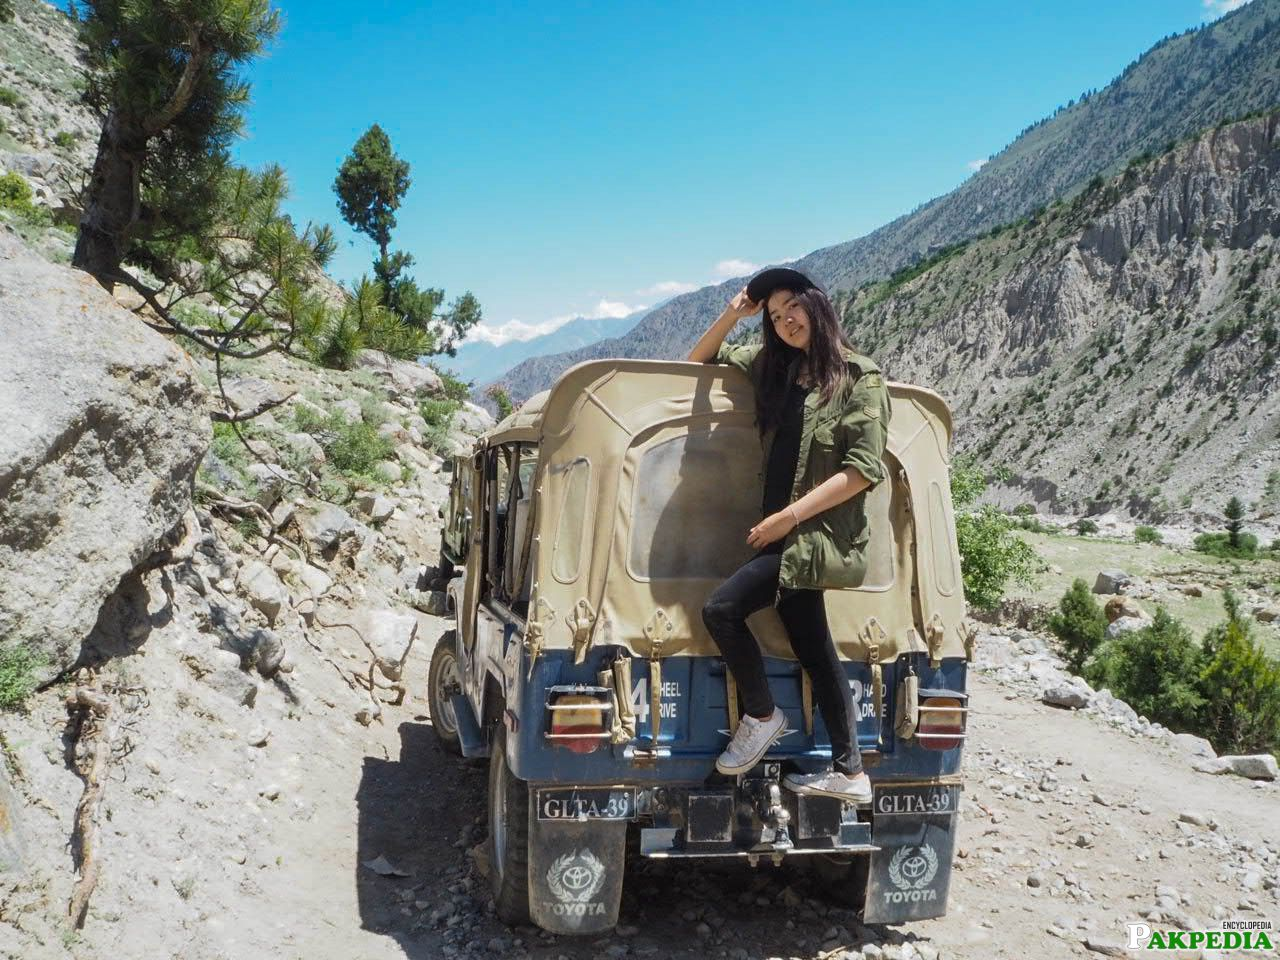 Thai tourist in Gilgit-Baltistan pakistan